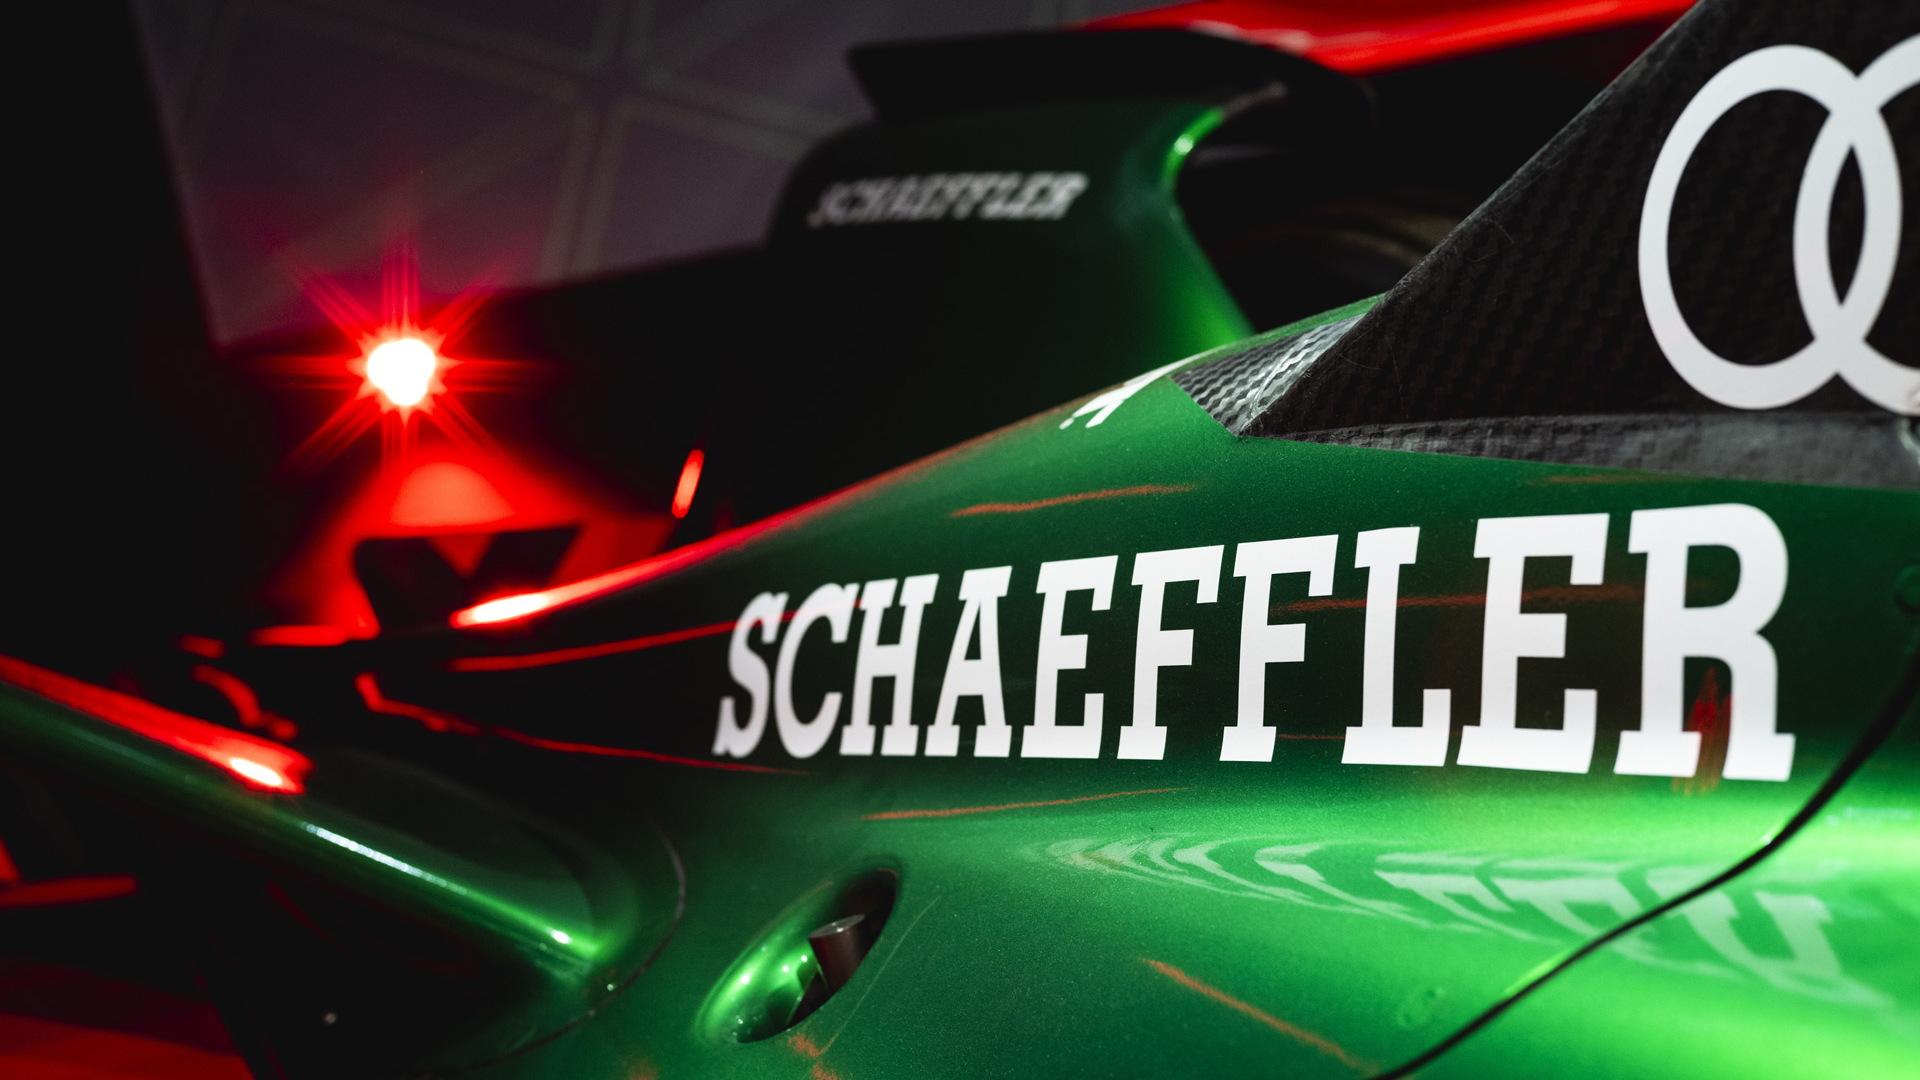 2020/2021 Audi E-Tron FE07 Formula E race car